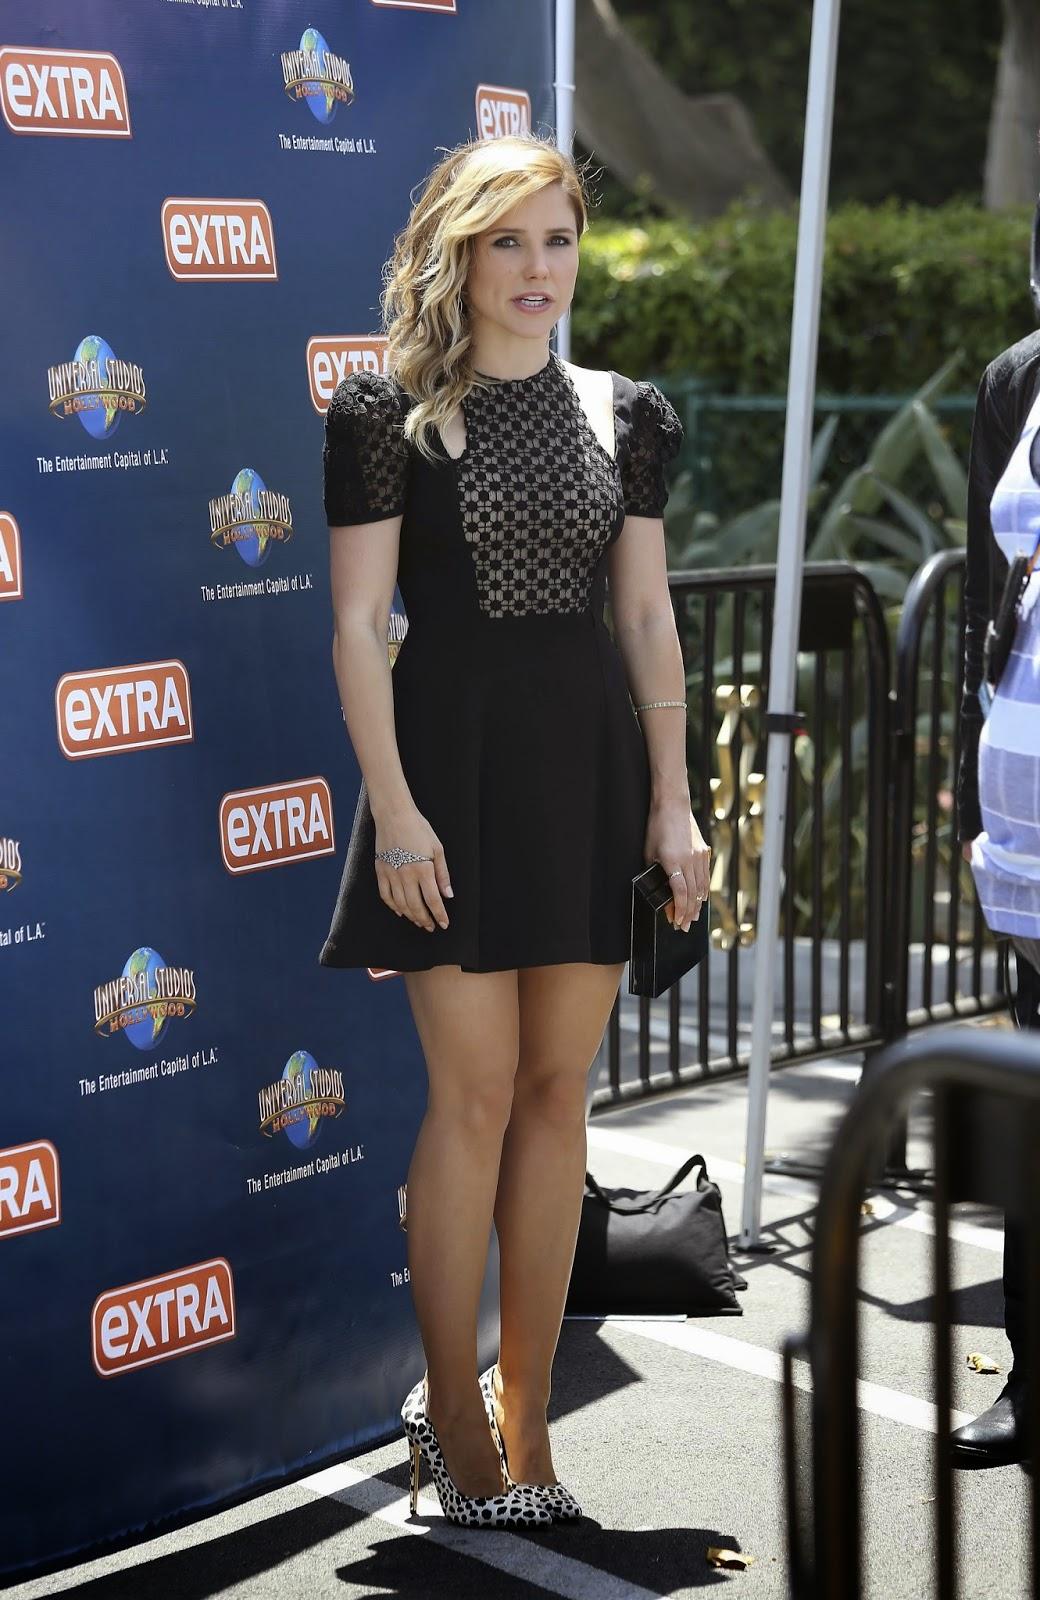 Sophia Bush on set of EXTRA in Universal City 19/05/2014